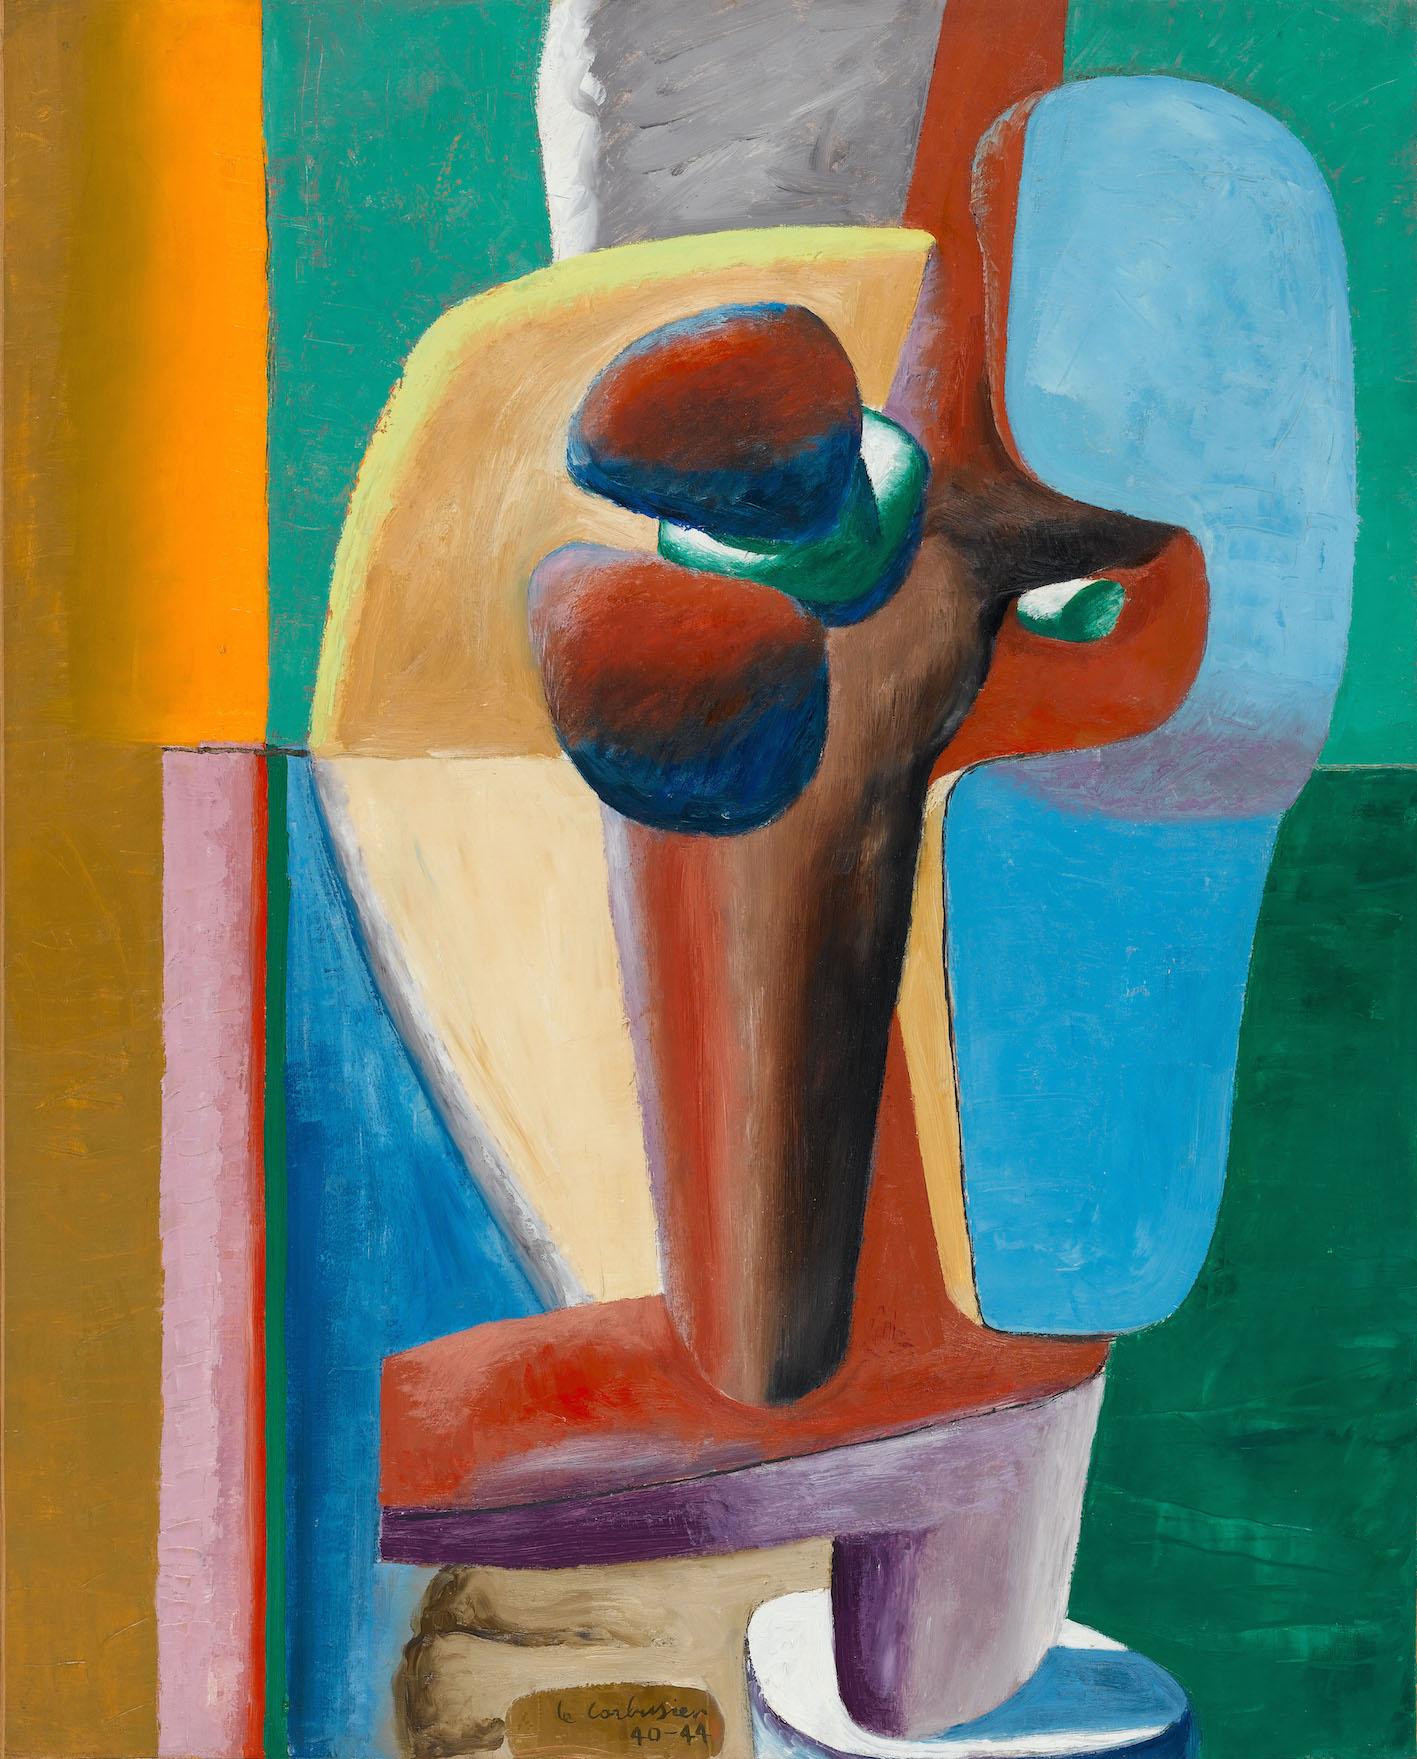 Le Corbusier, Ubu IV, 1940 - 1944.